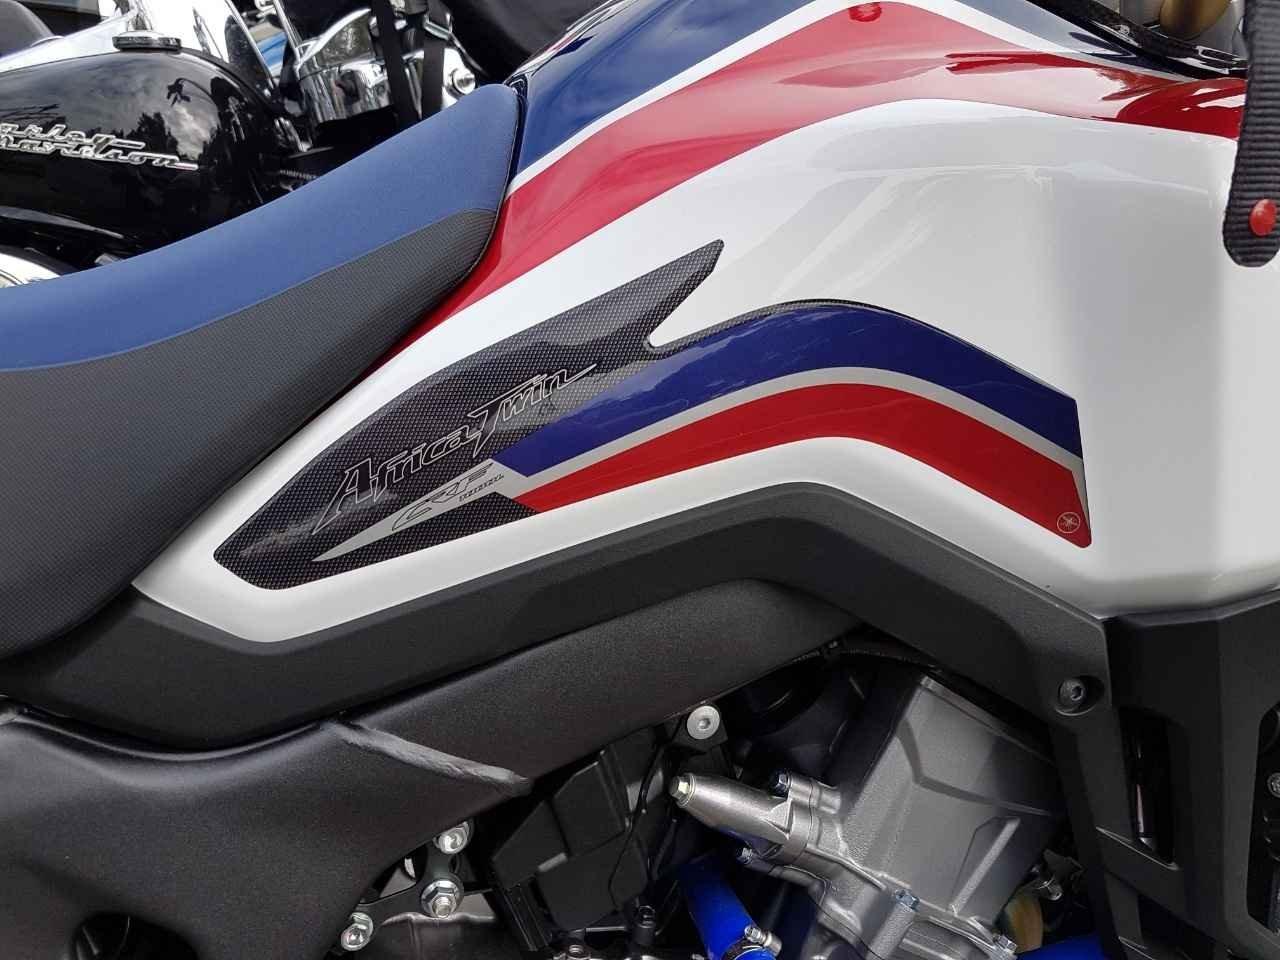 2 Aufkleber 3d Metall Schutz Seitenlichter Kompatibel x moto honda ...